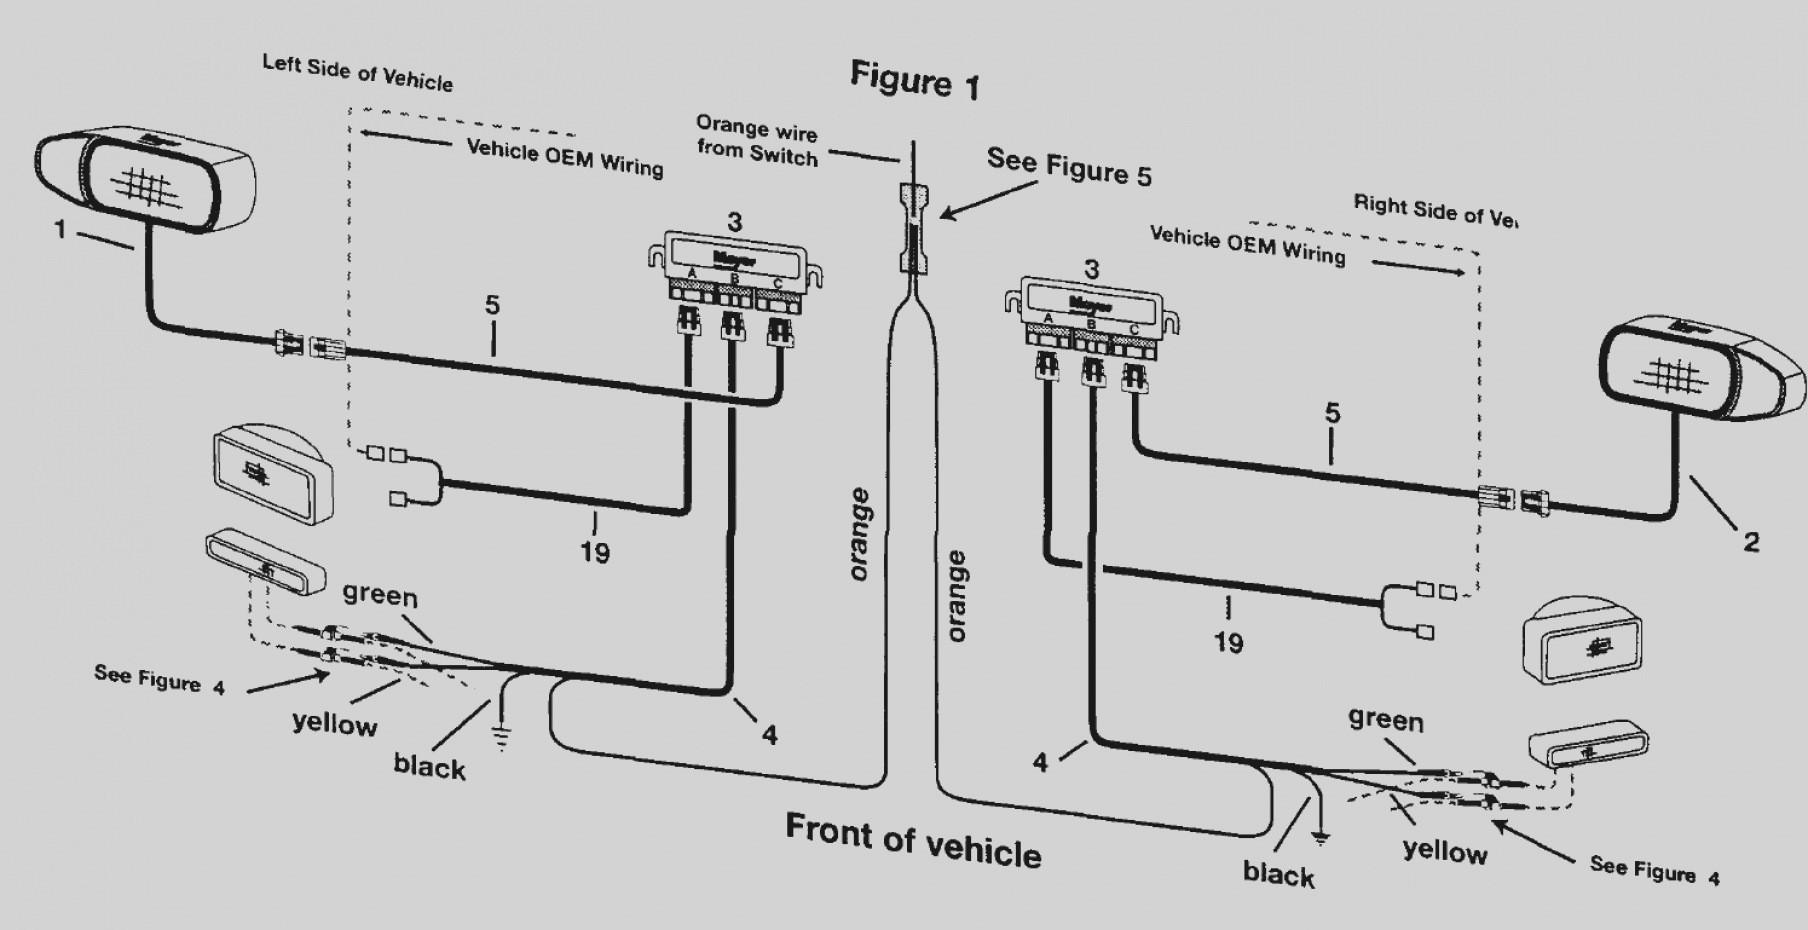 Snow Plow Lights Wiring Diagram Wiring Diagram Image Meyer Plow Control Diagram  Meyer Plow Wiring Diagram 68